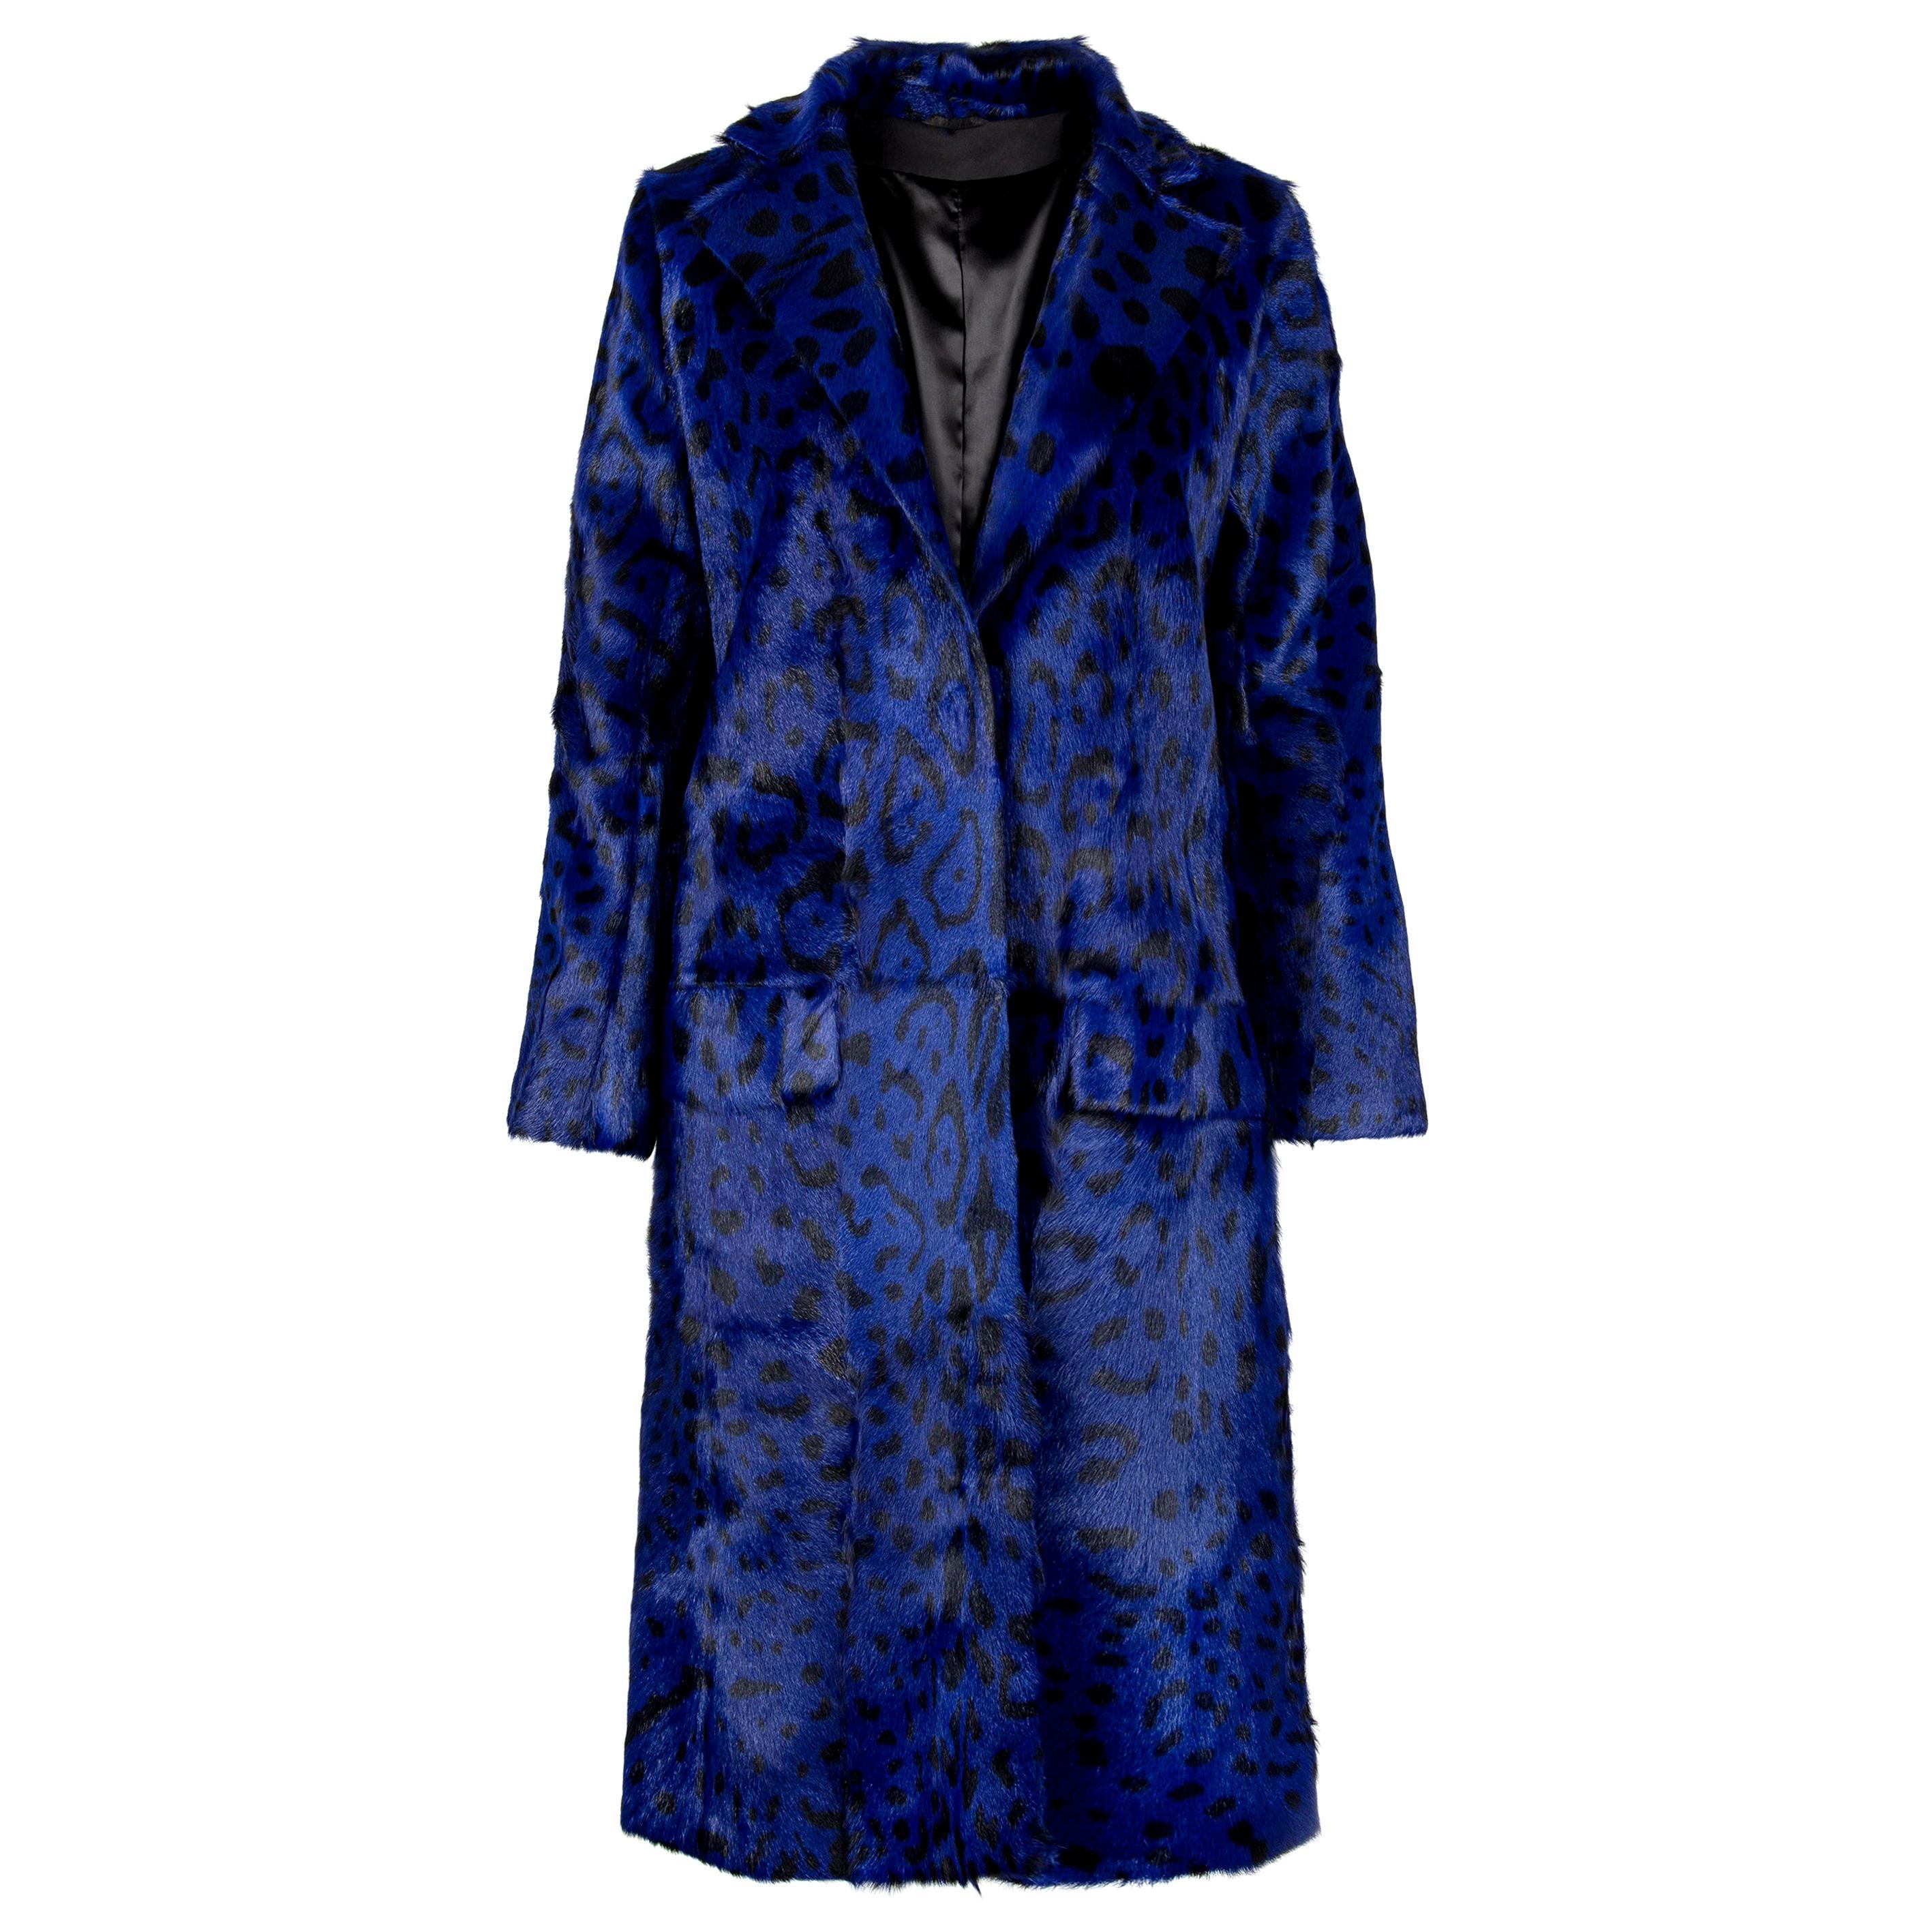 Verheyen London Ink Blue Leopard Print Coat in Goat Hair Fur UK 10